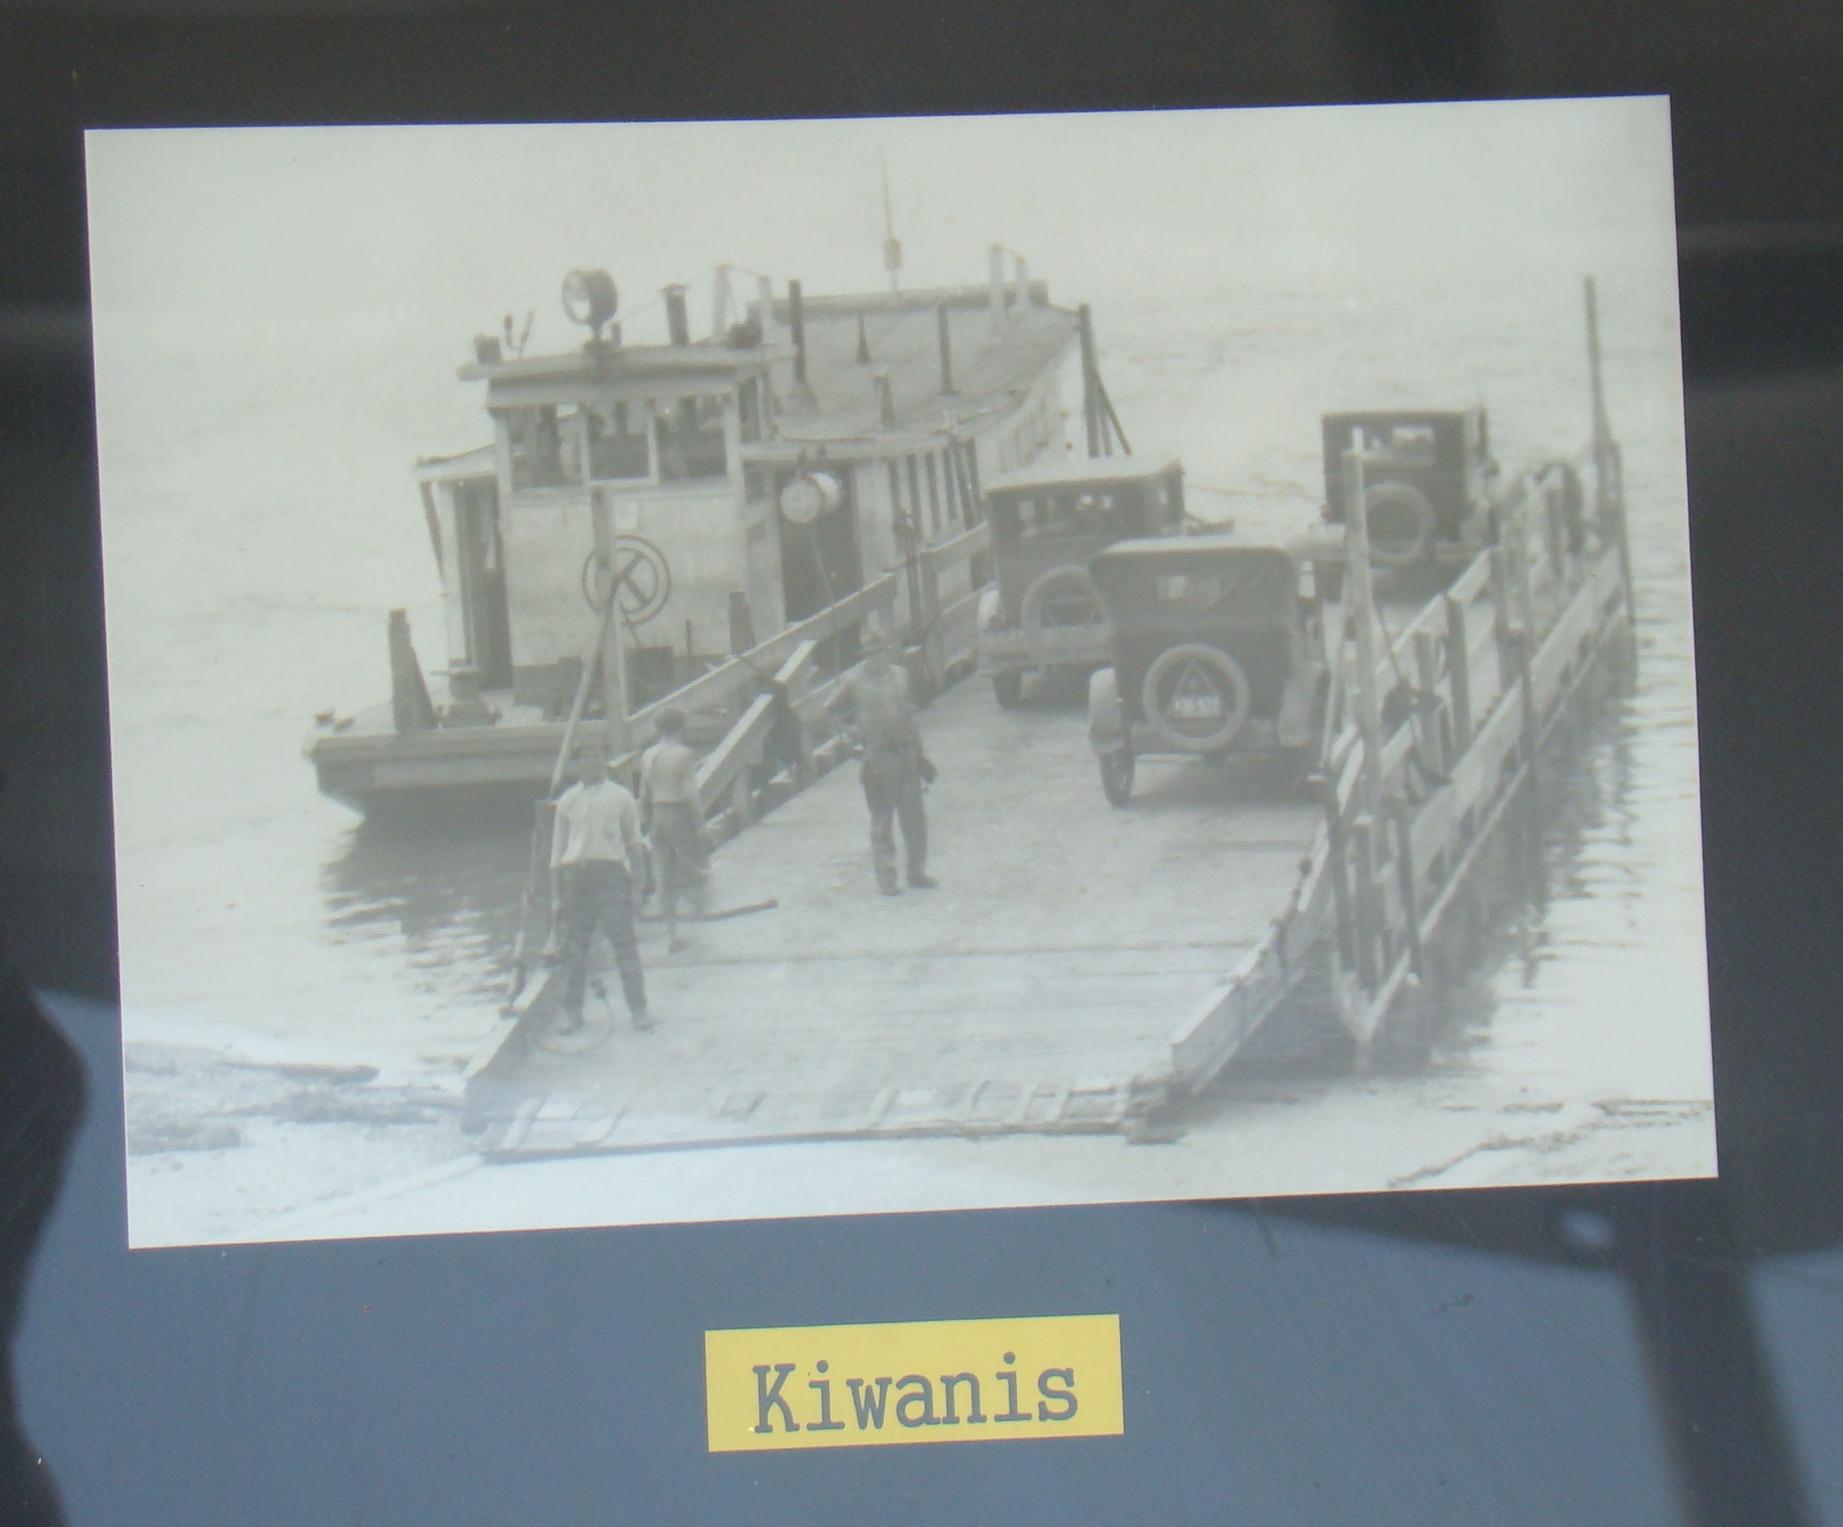 Fly Kiwanis